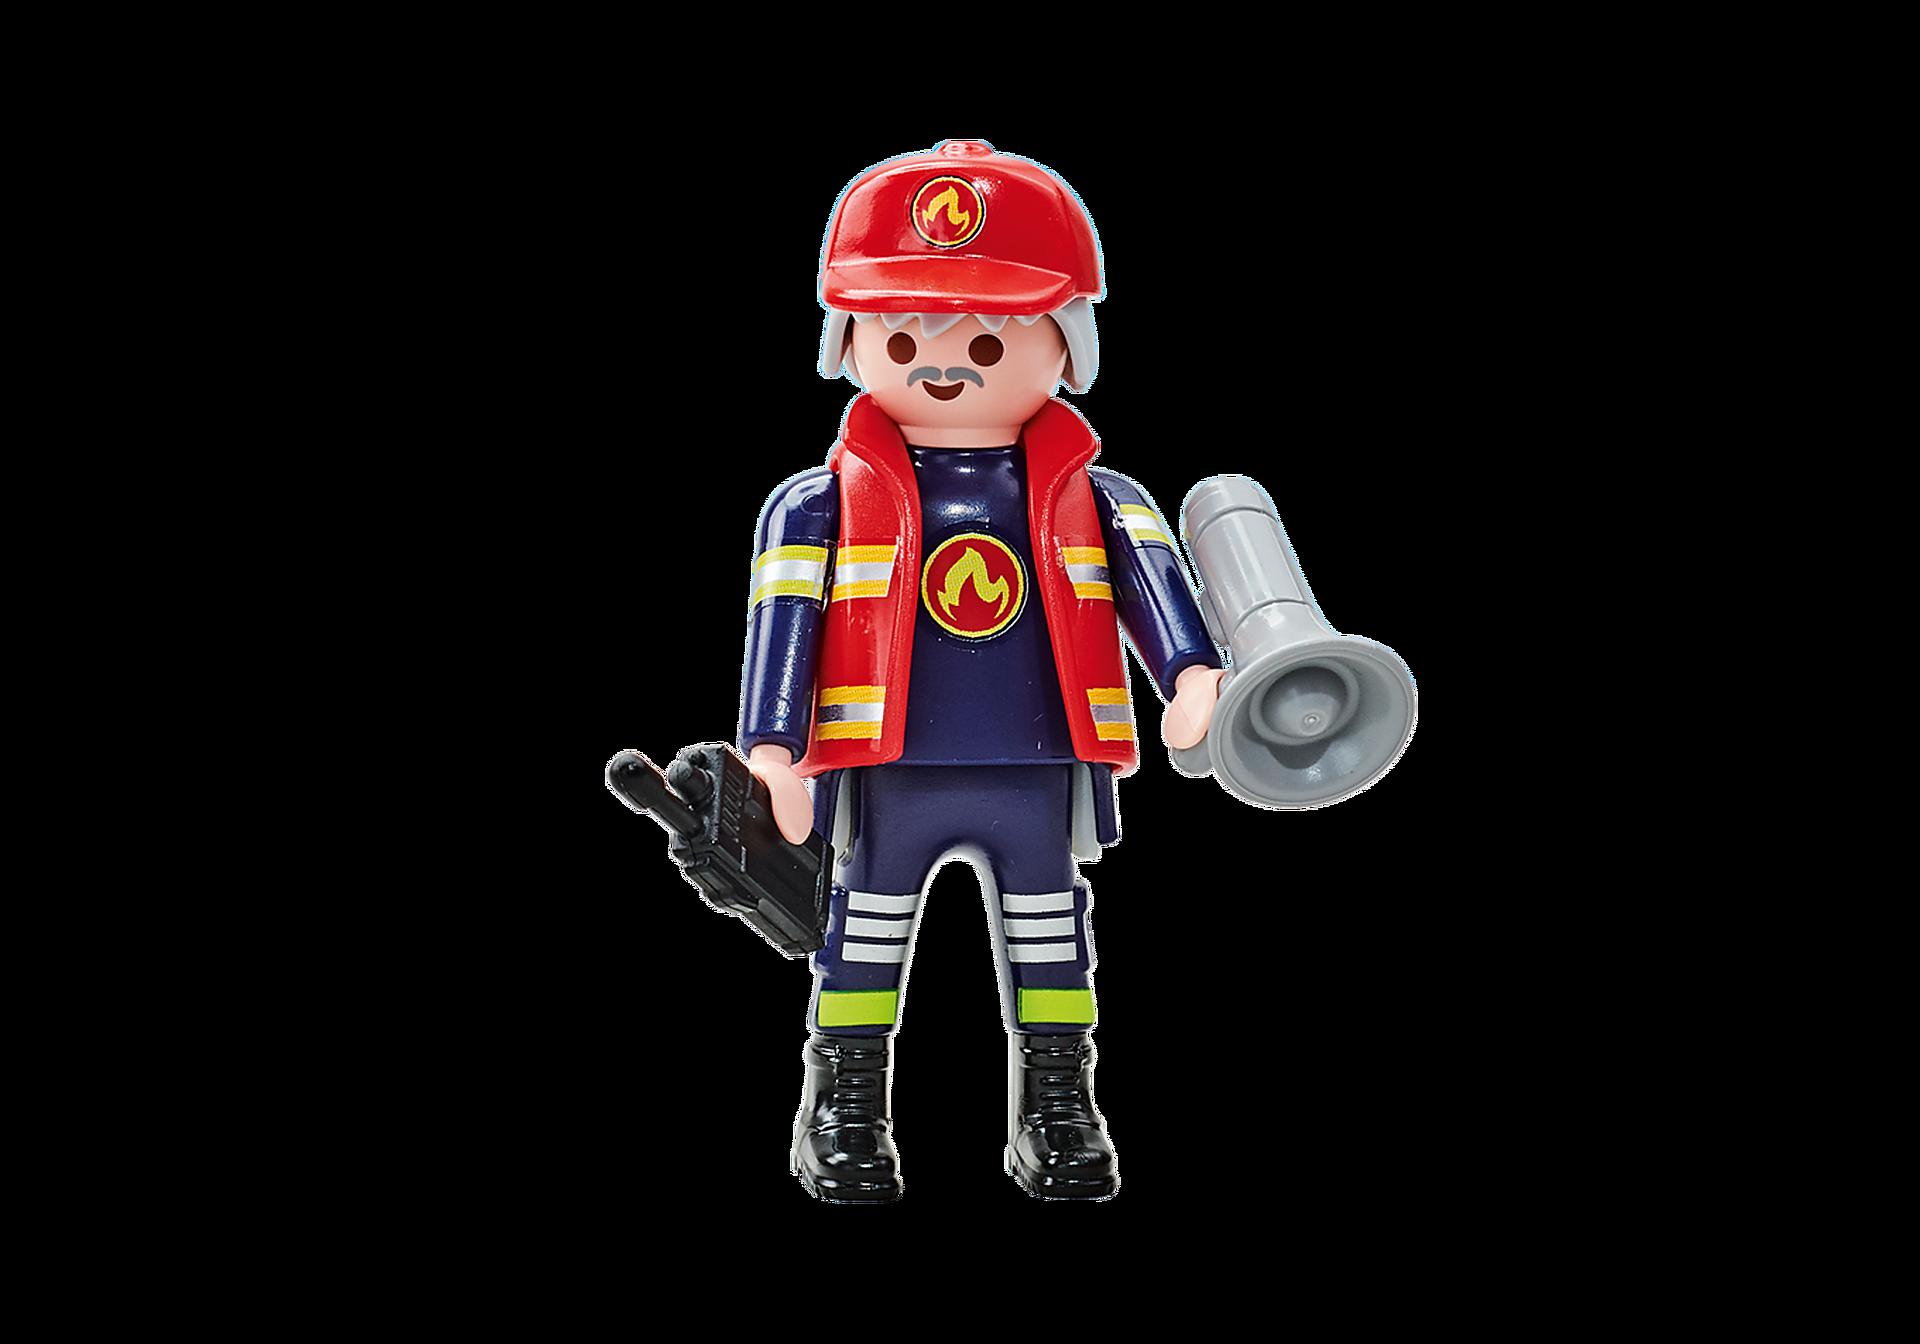 http://media.playmobil.com/i/playmobil/6585_product_detail/Επικεφαλής Πυροσβέστης Ομάδας Β